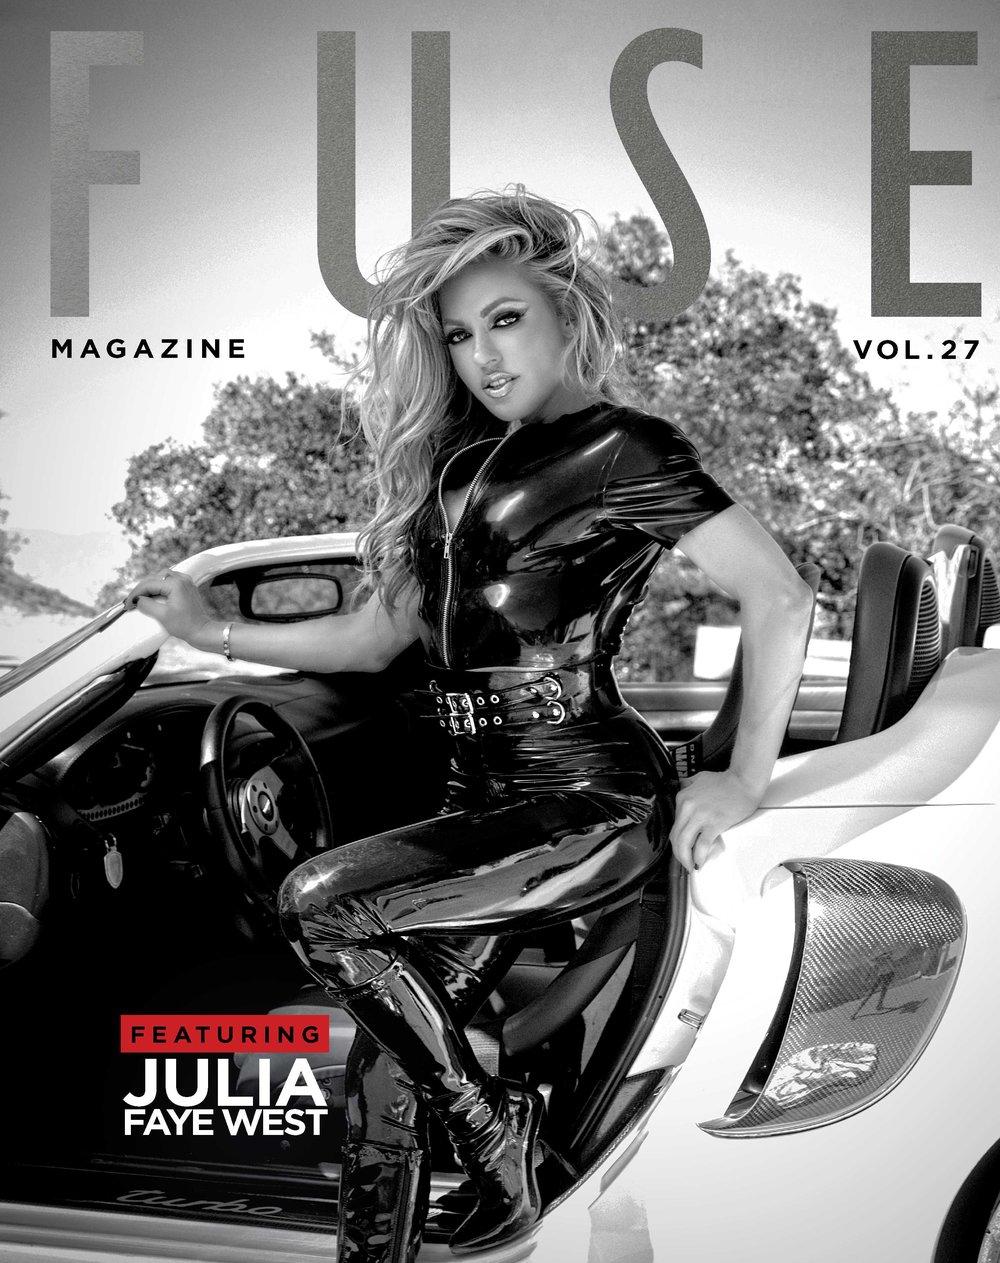 FuseMagazineOnline VOL 27